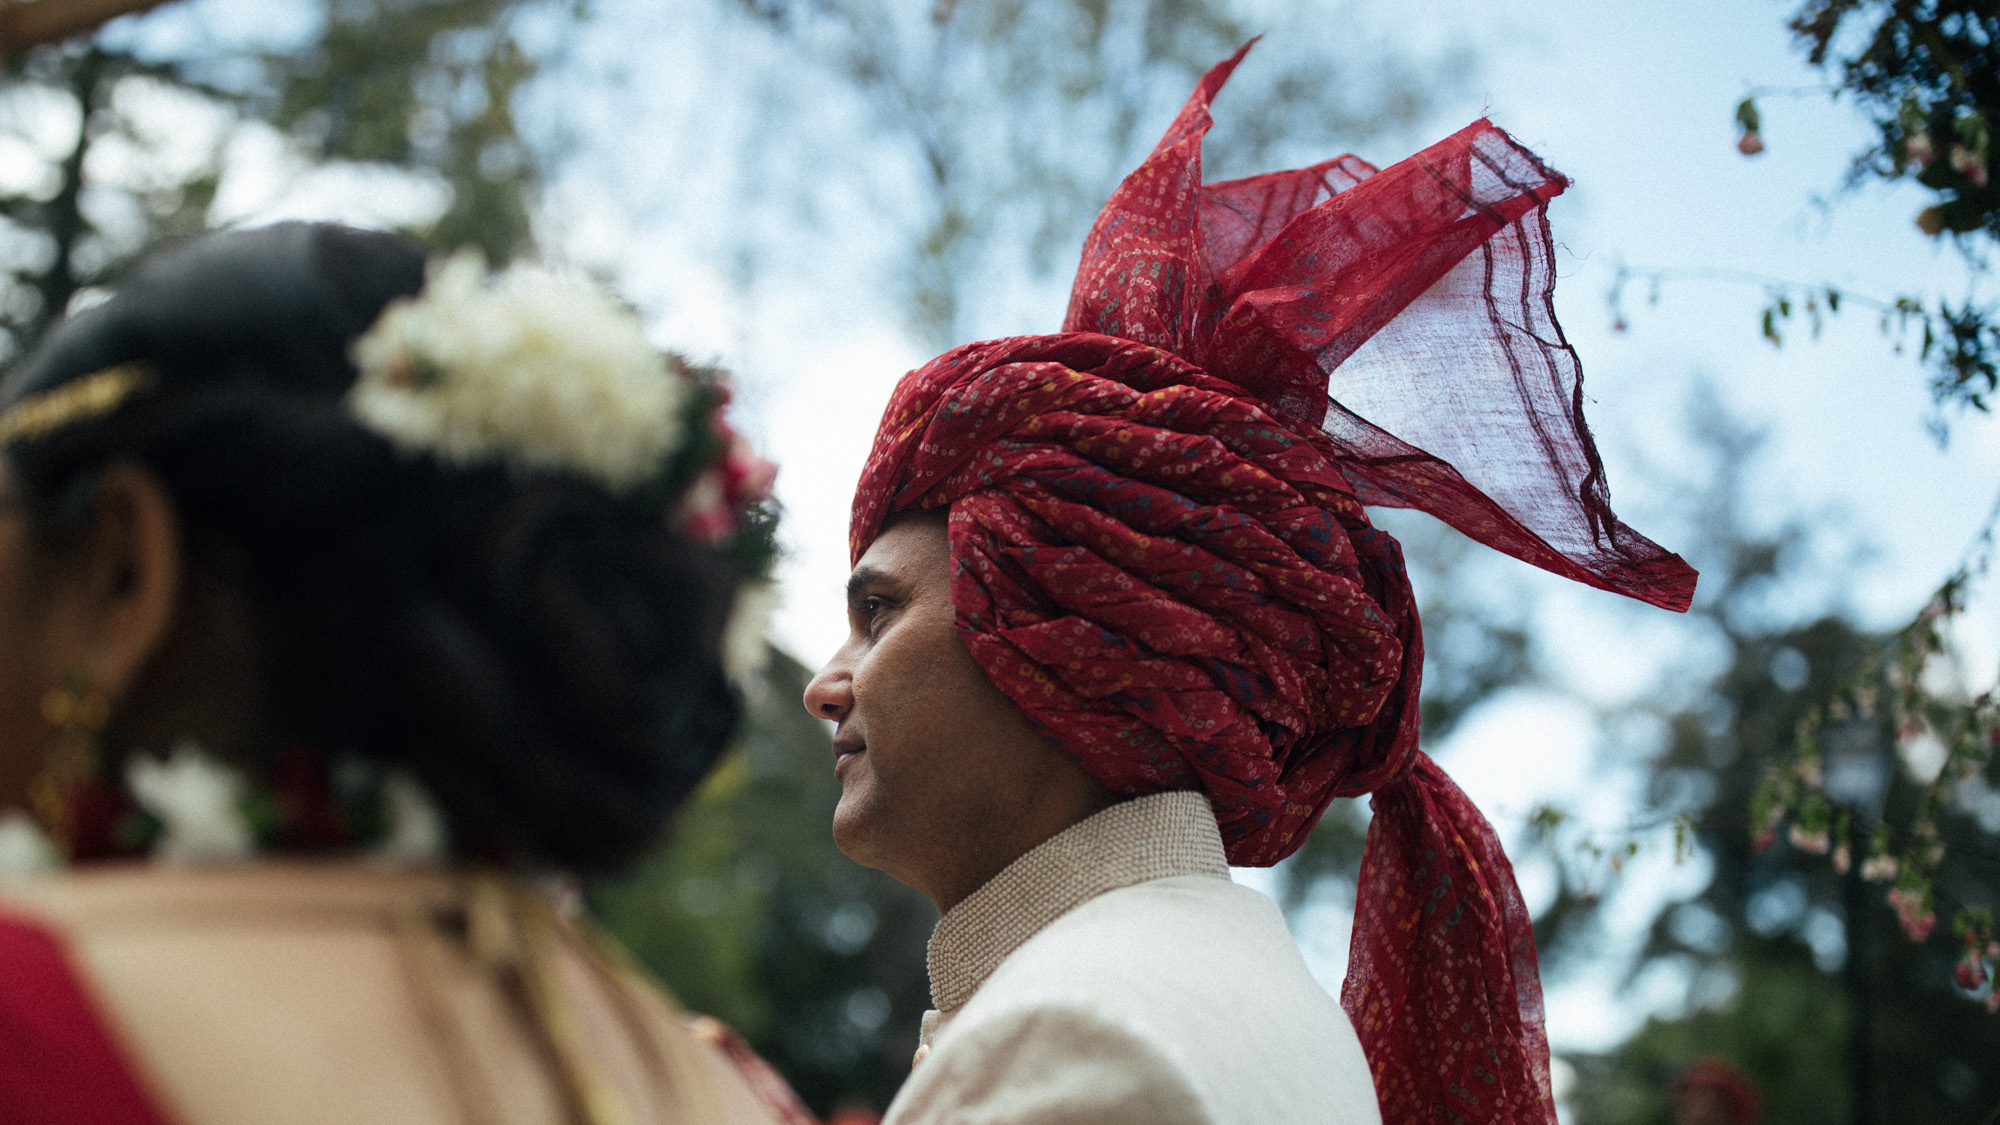 anu_maneesh_alec_vanderboom_Indian_wedding_photography-0100.jpg